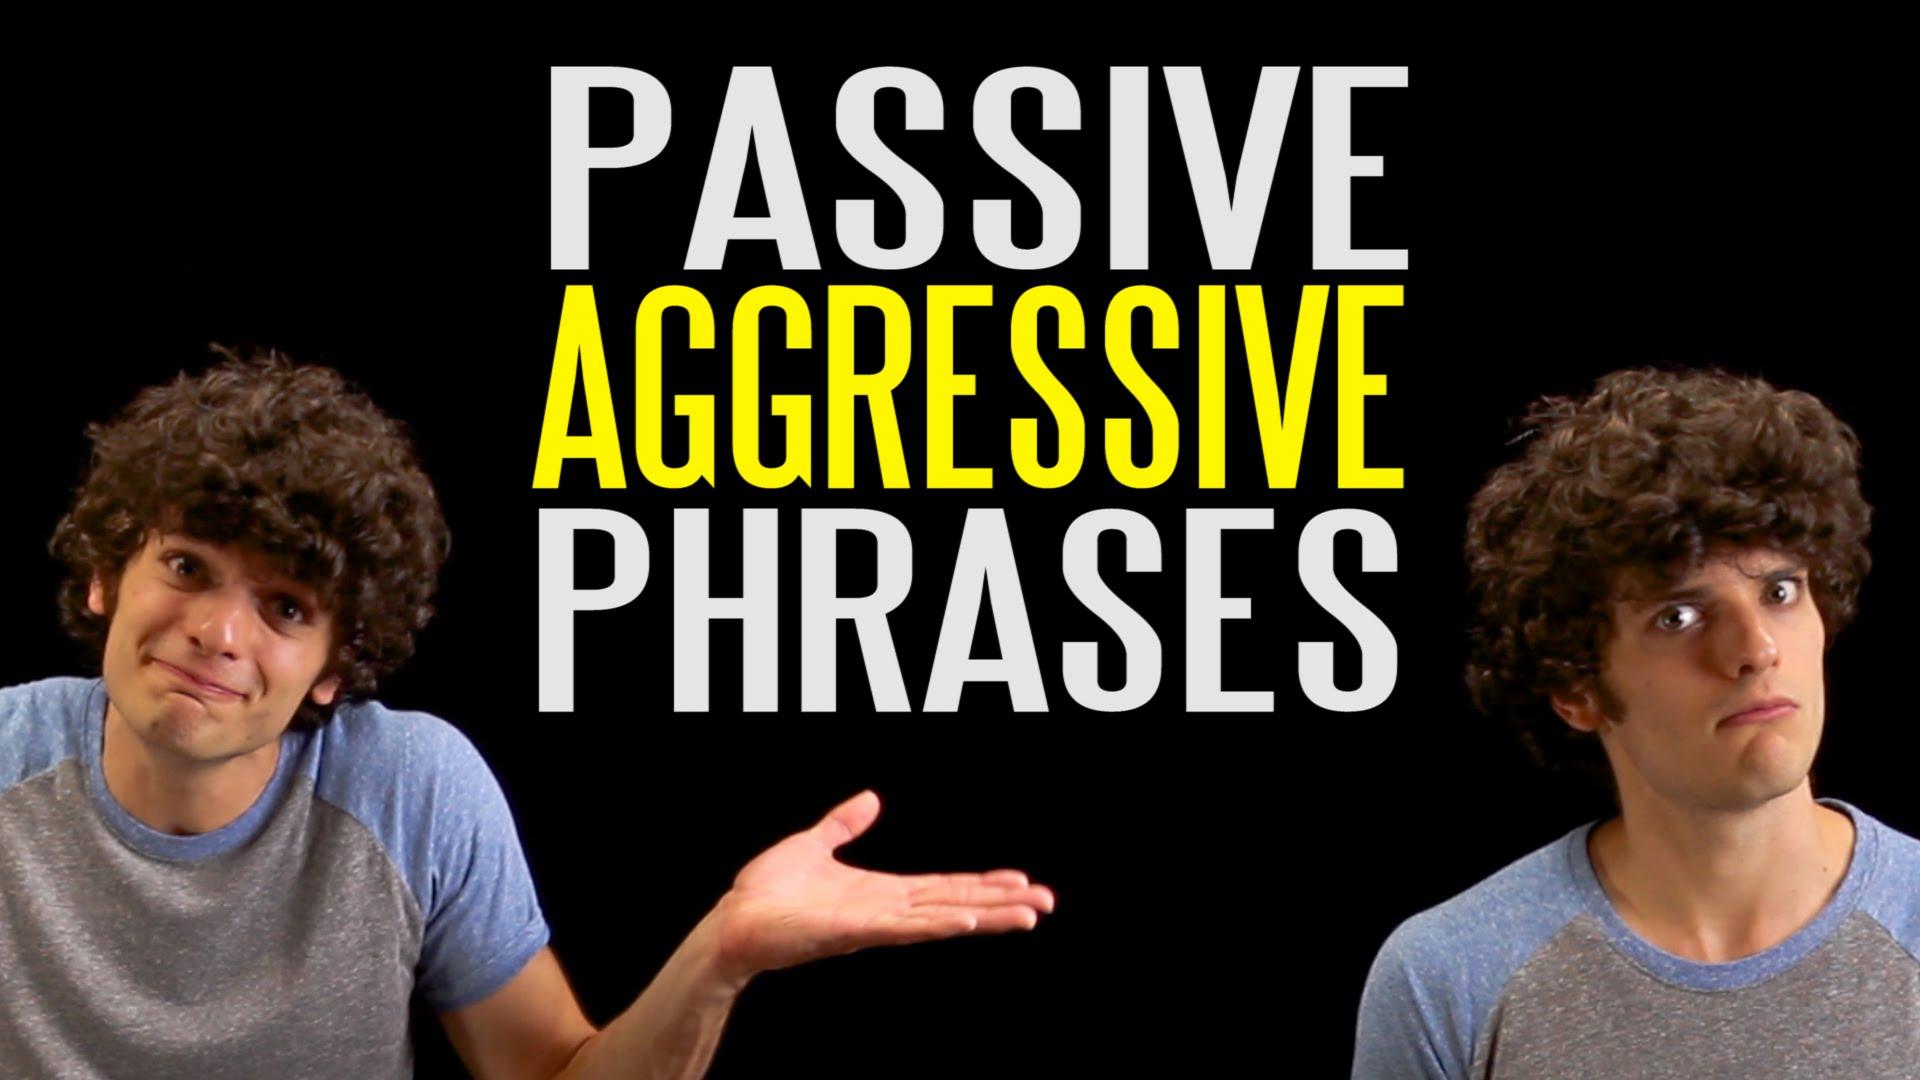 The Ten Most Passive Aggressive Phrases (Youth)